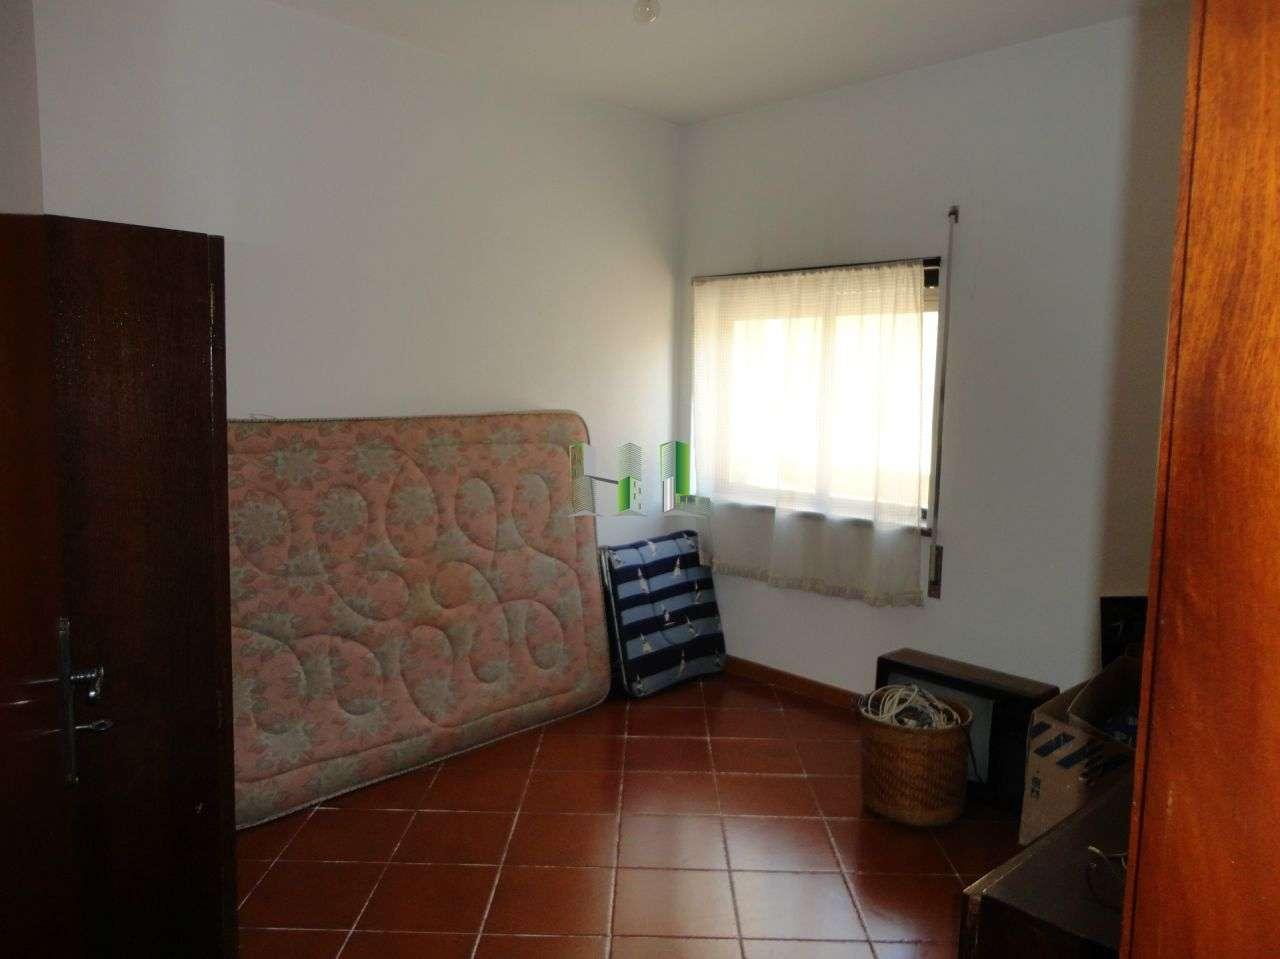 Moradia para comprar, Louriçal, Pombal, Leiria - Foto 11